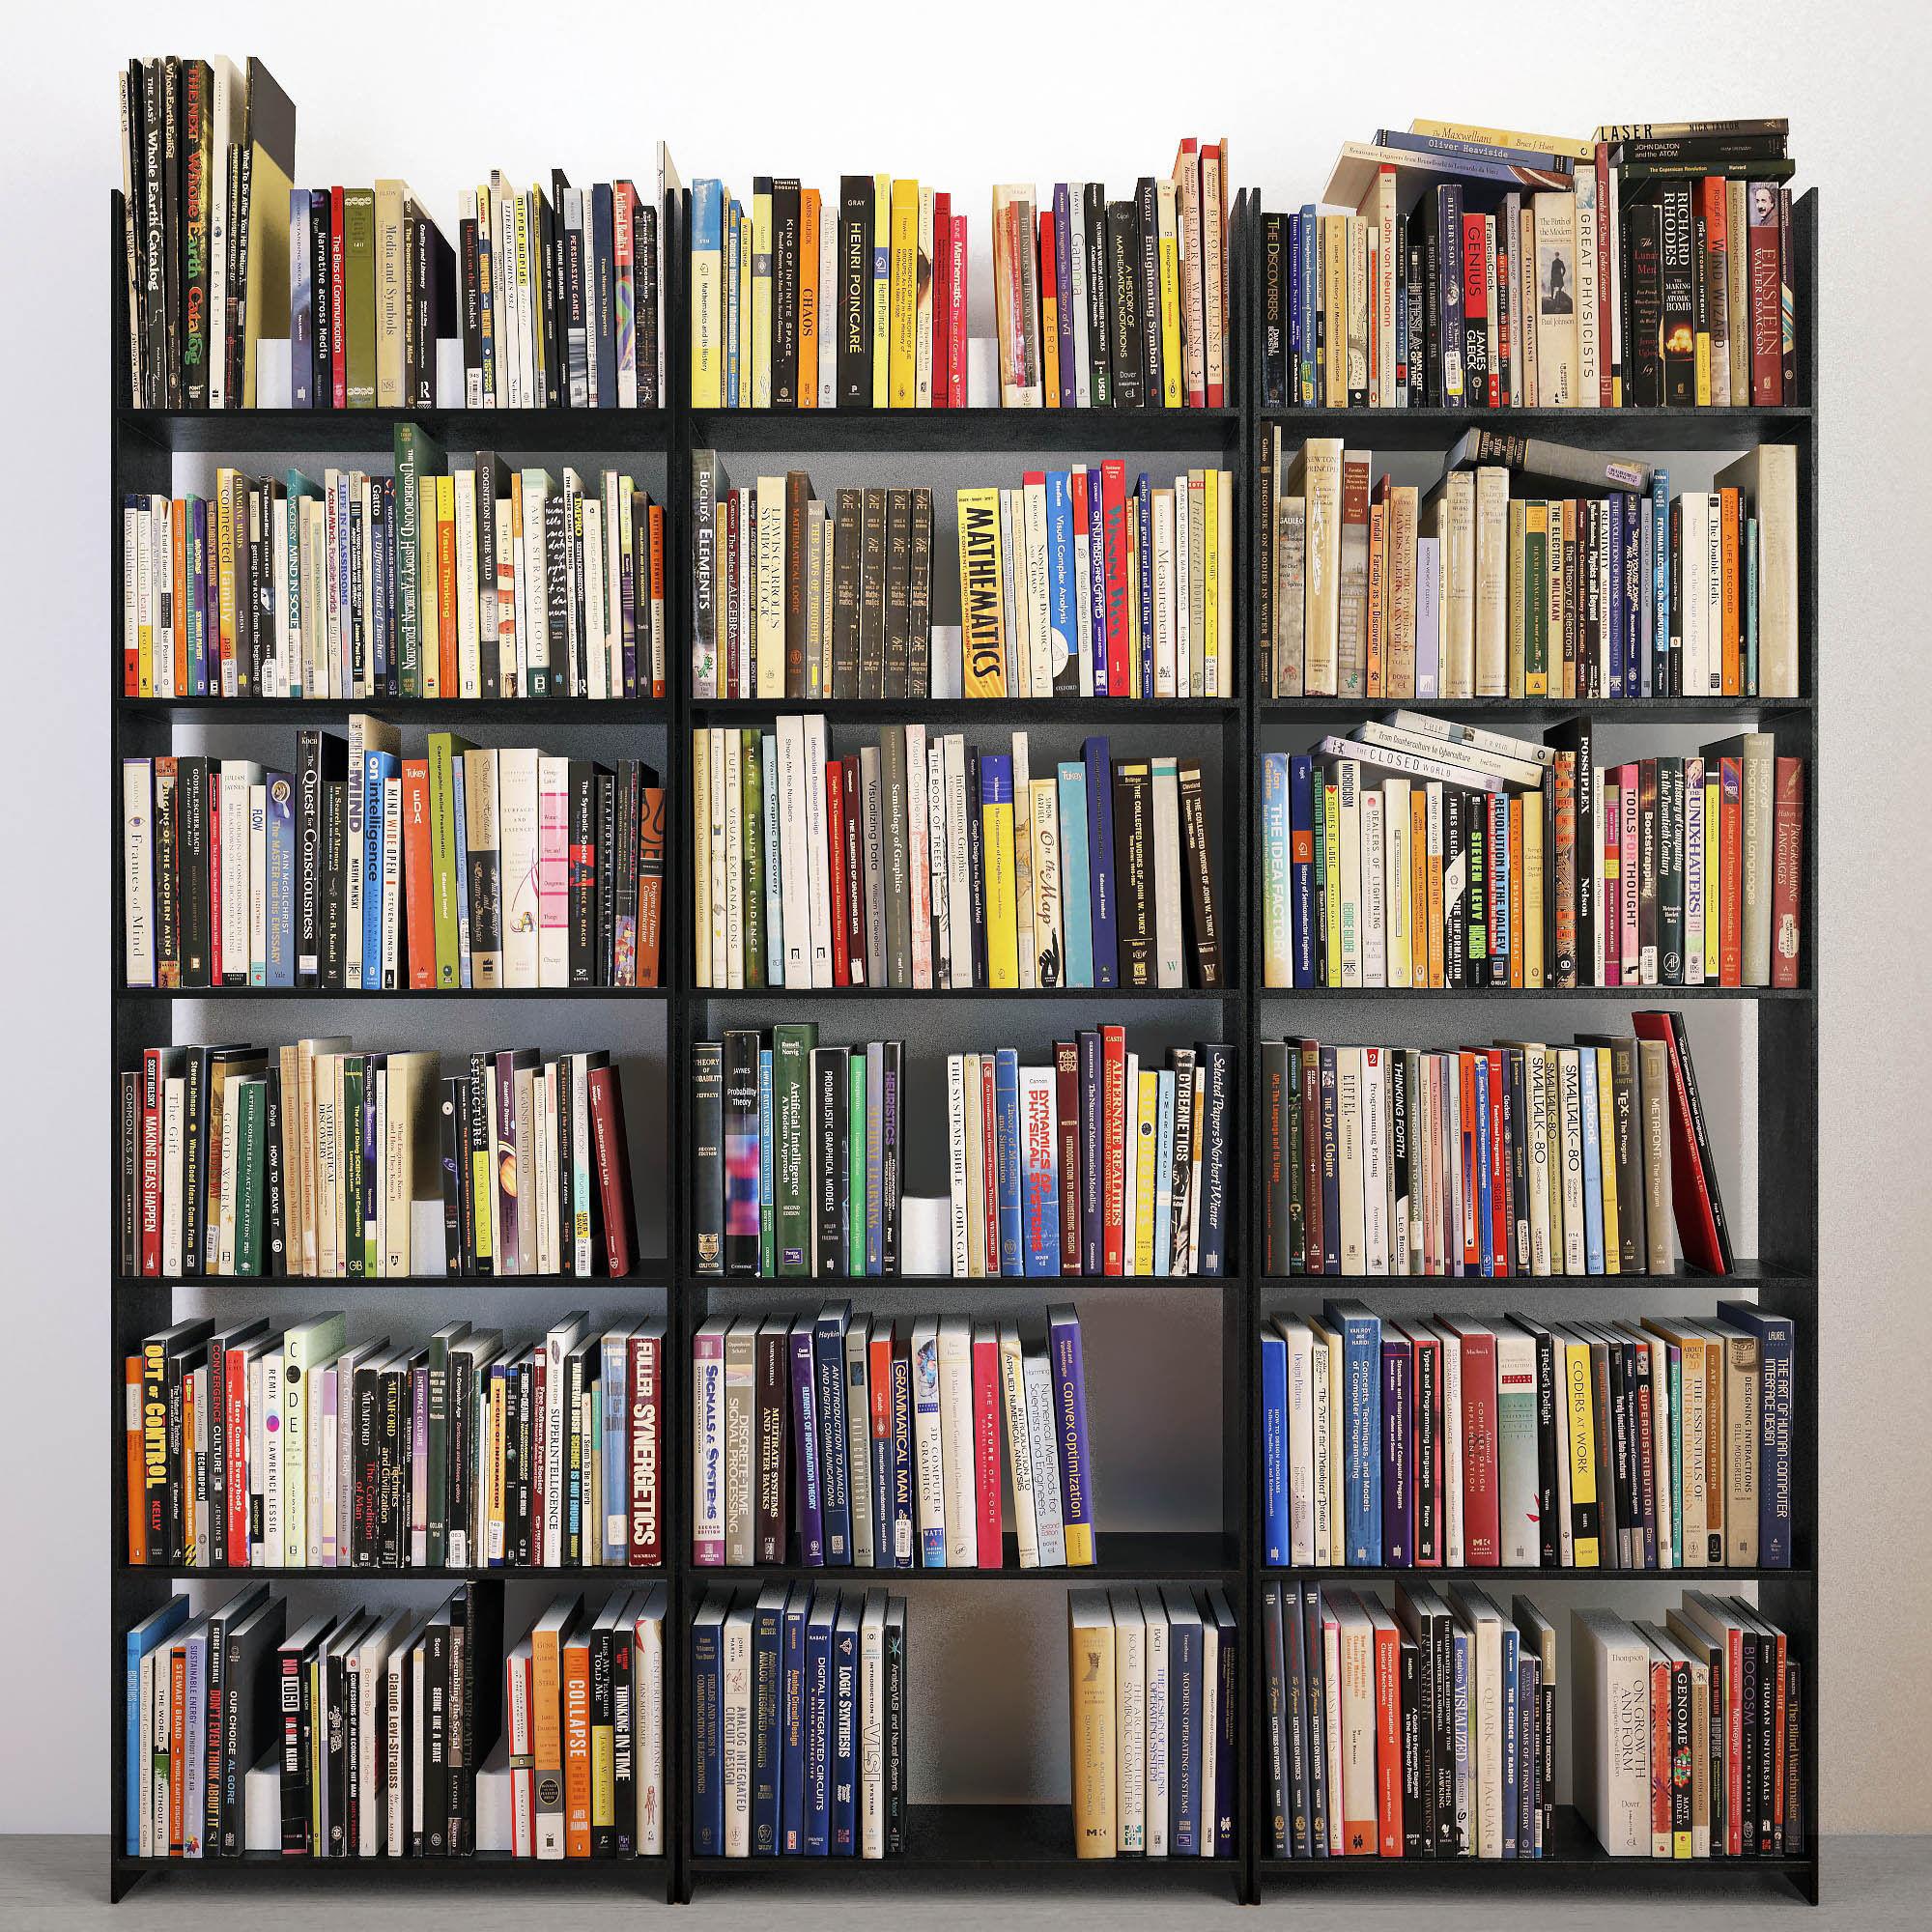 474 books set